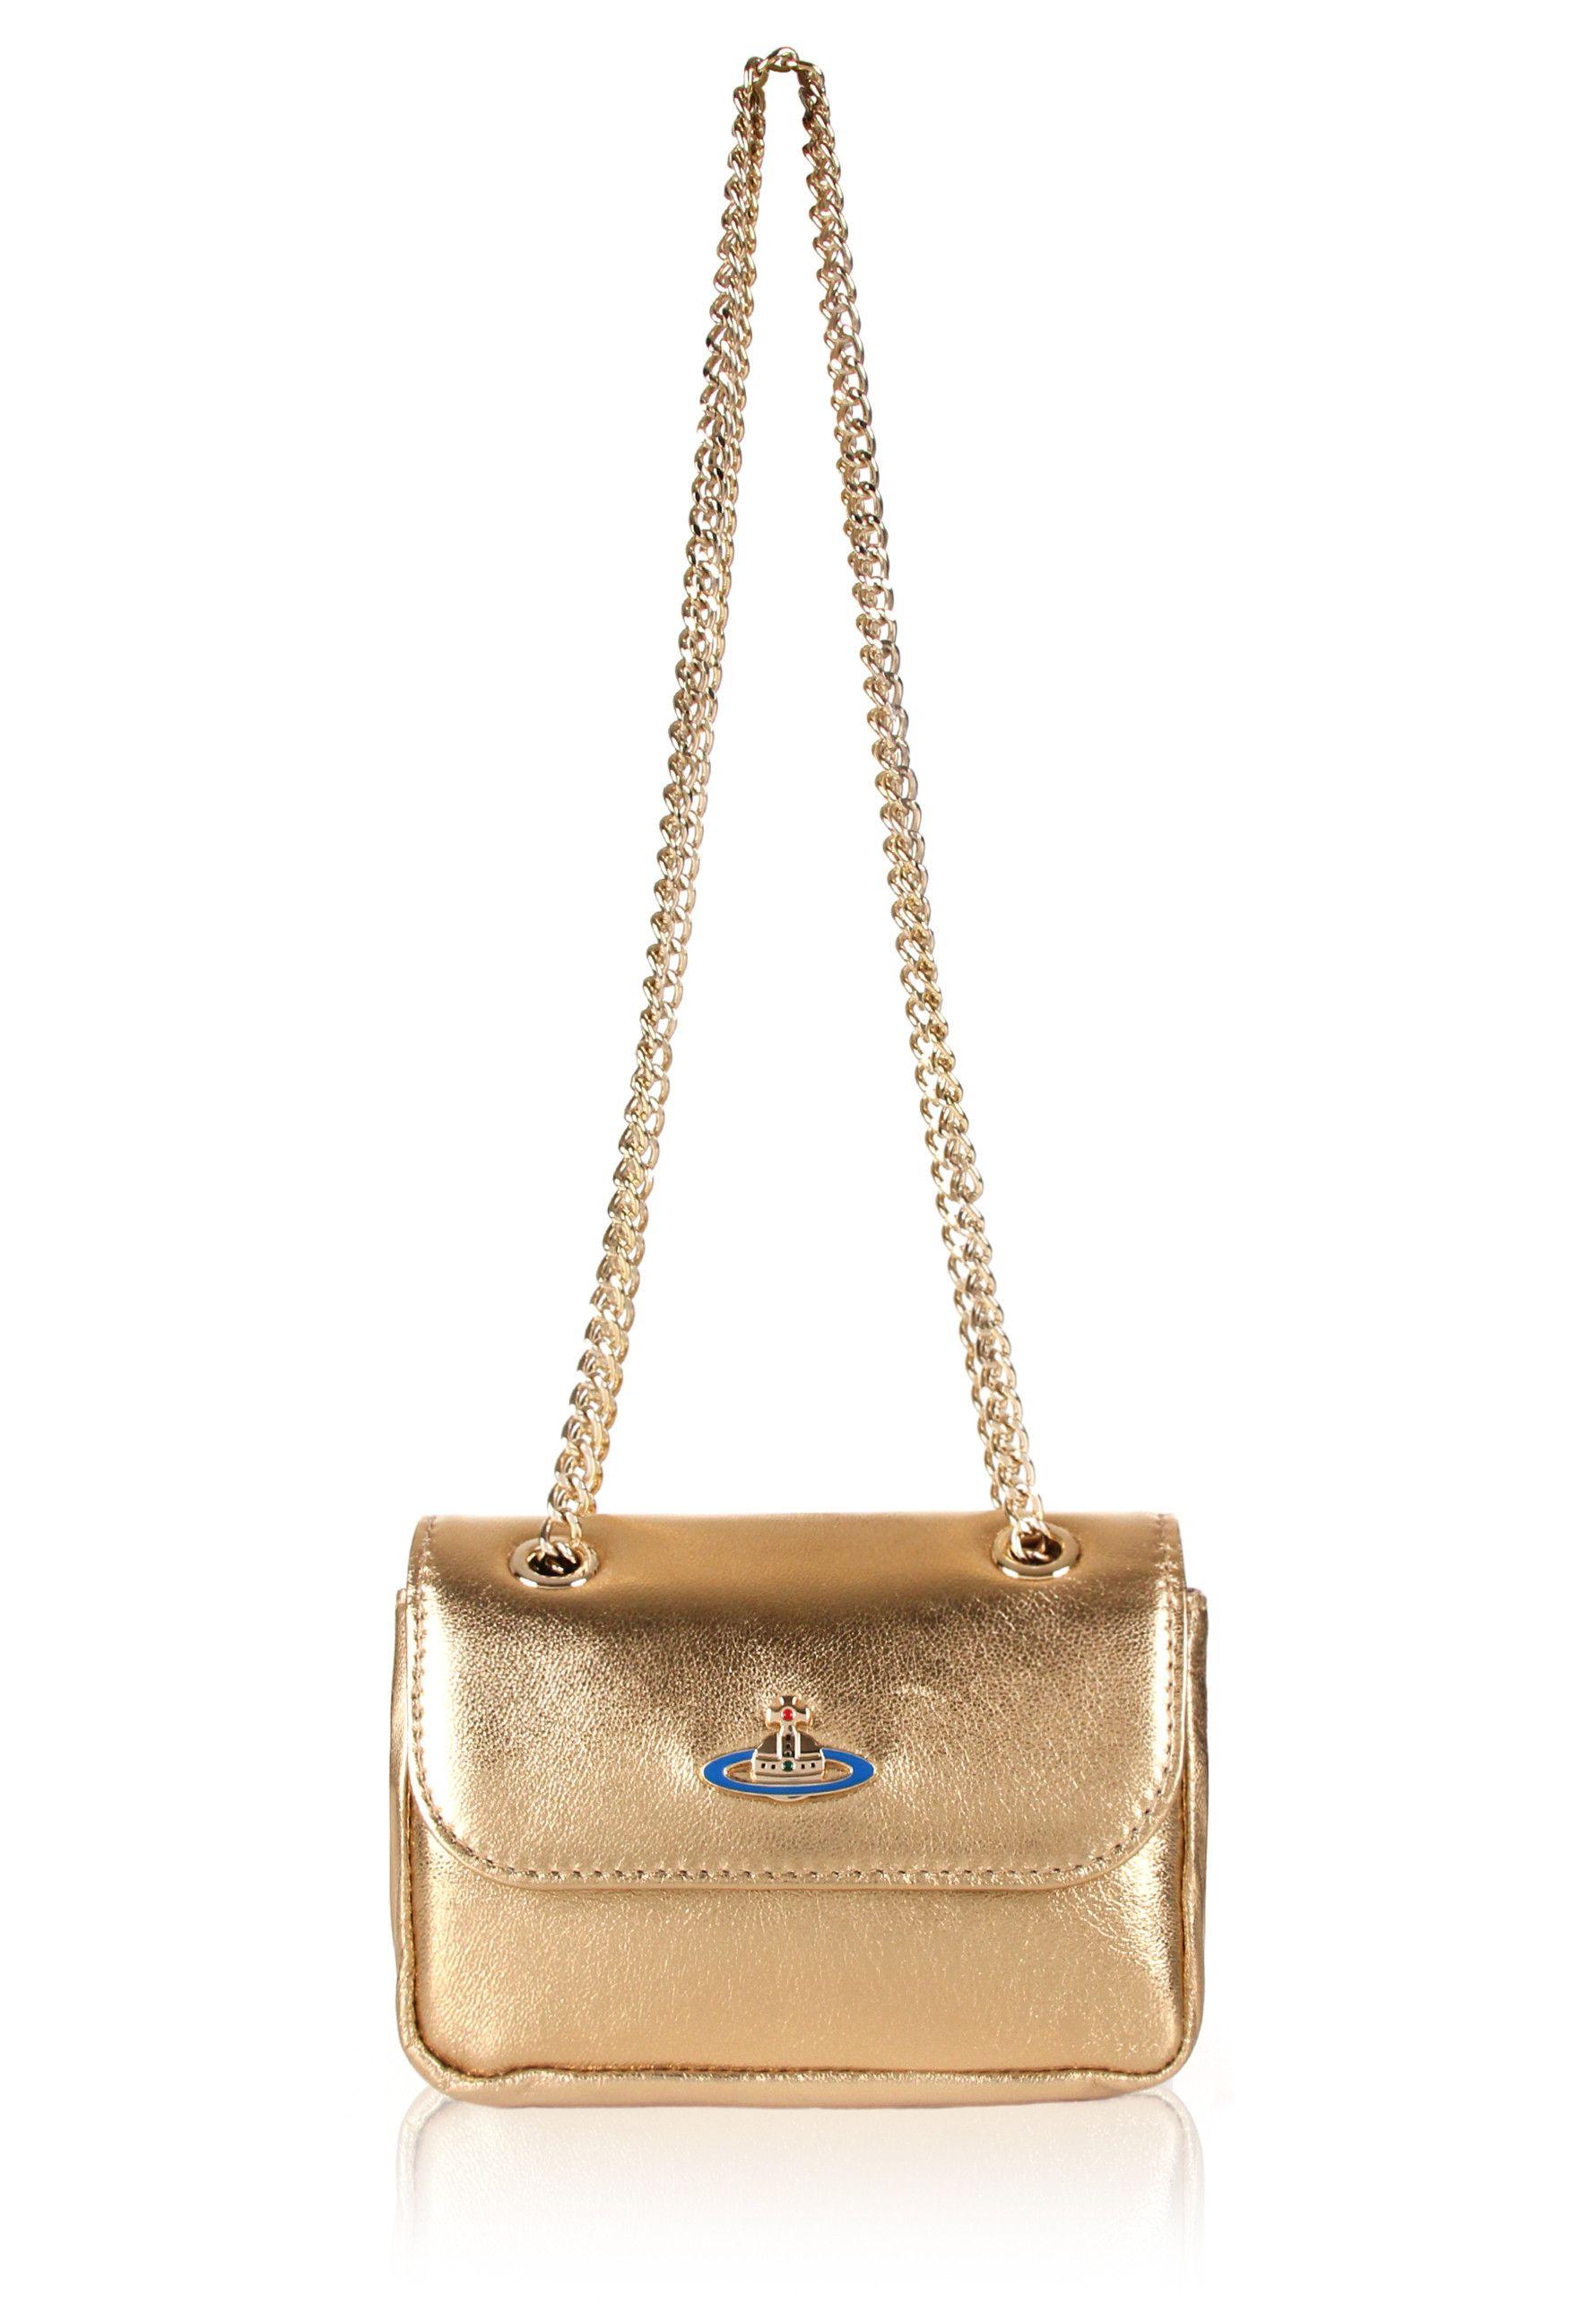 52328ac28a2 Vivienne Westwood Nappa 52020005 Tiny Crossbody Bag in gold. Vivienne  Westwood's tiny crossbody bag is